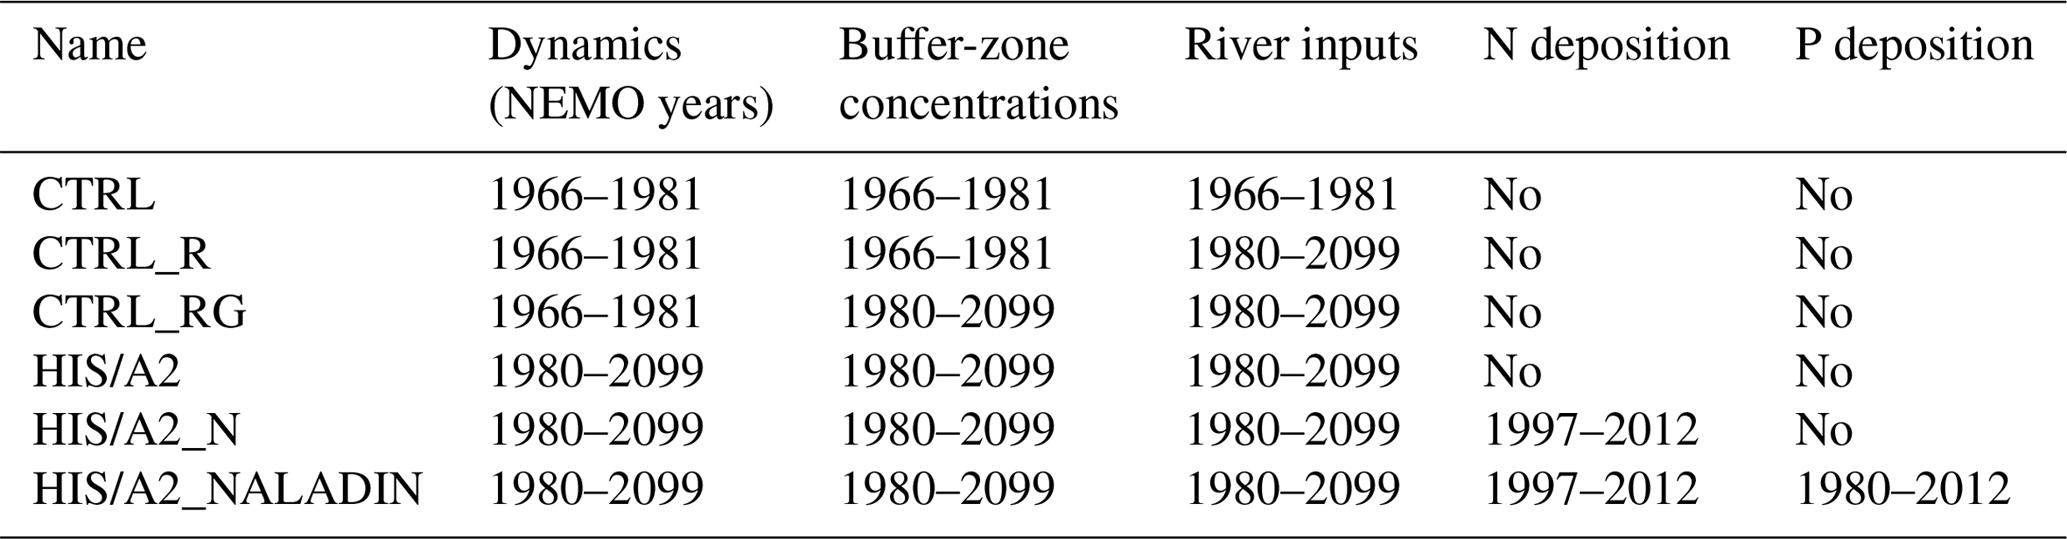 BG - Biogeochemical response of the Mediterranean Sea to the